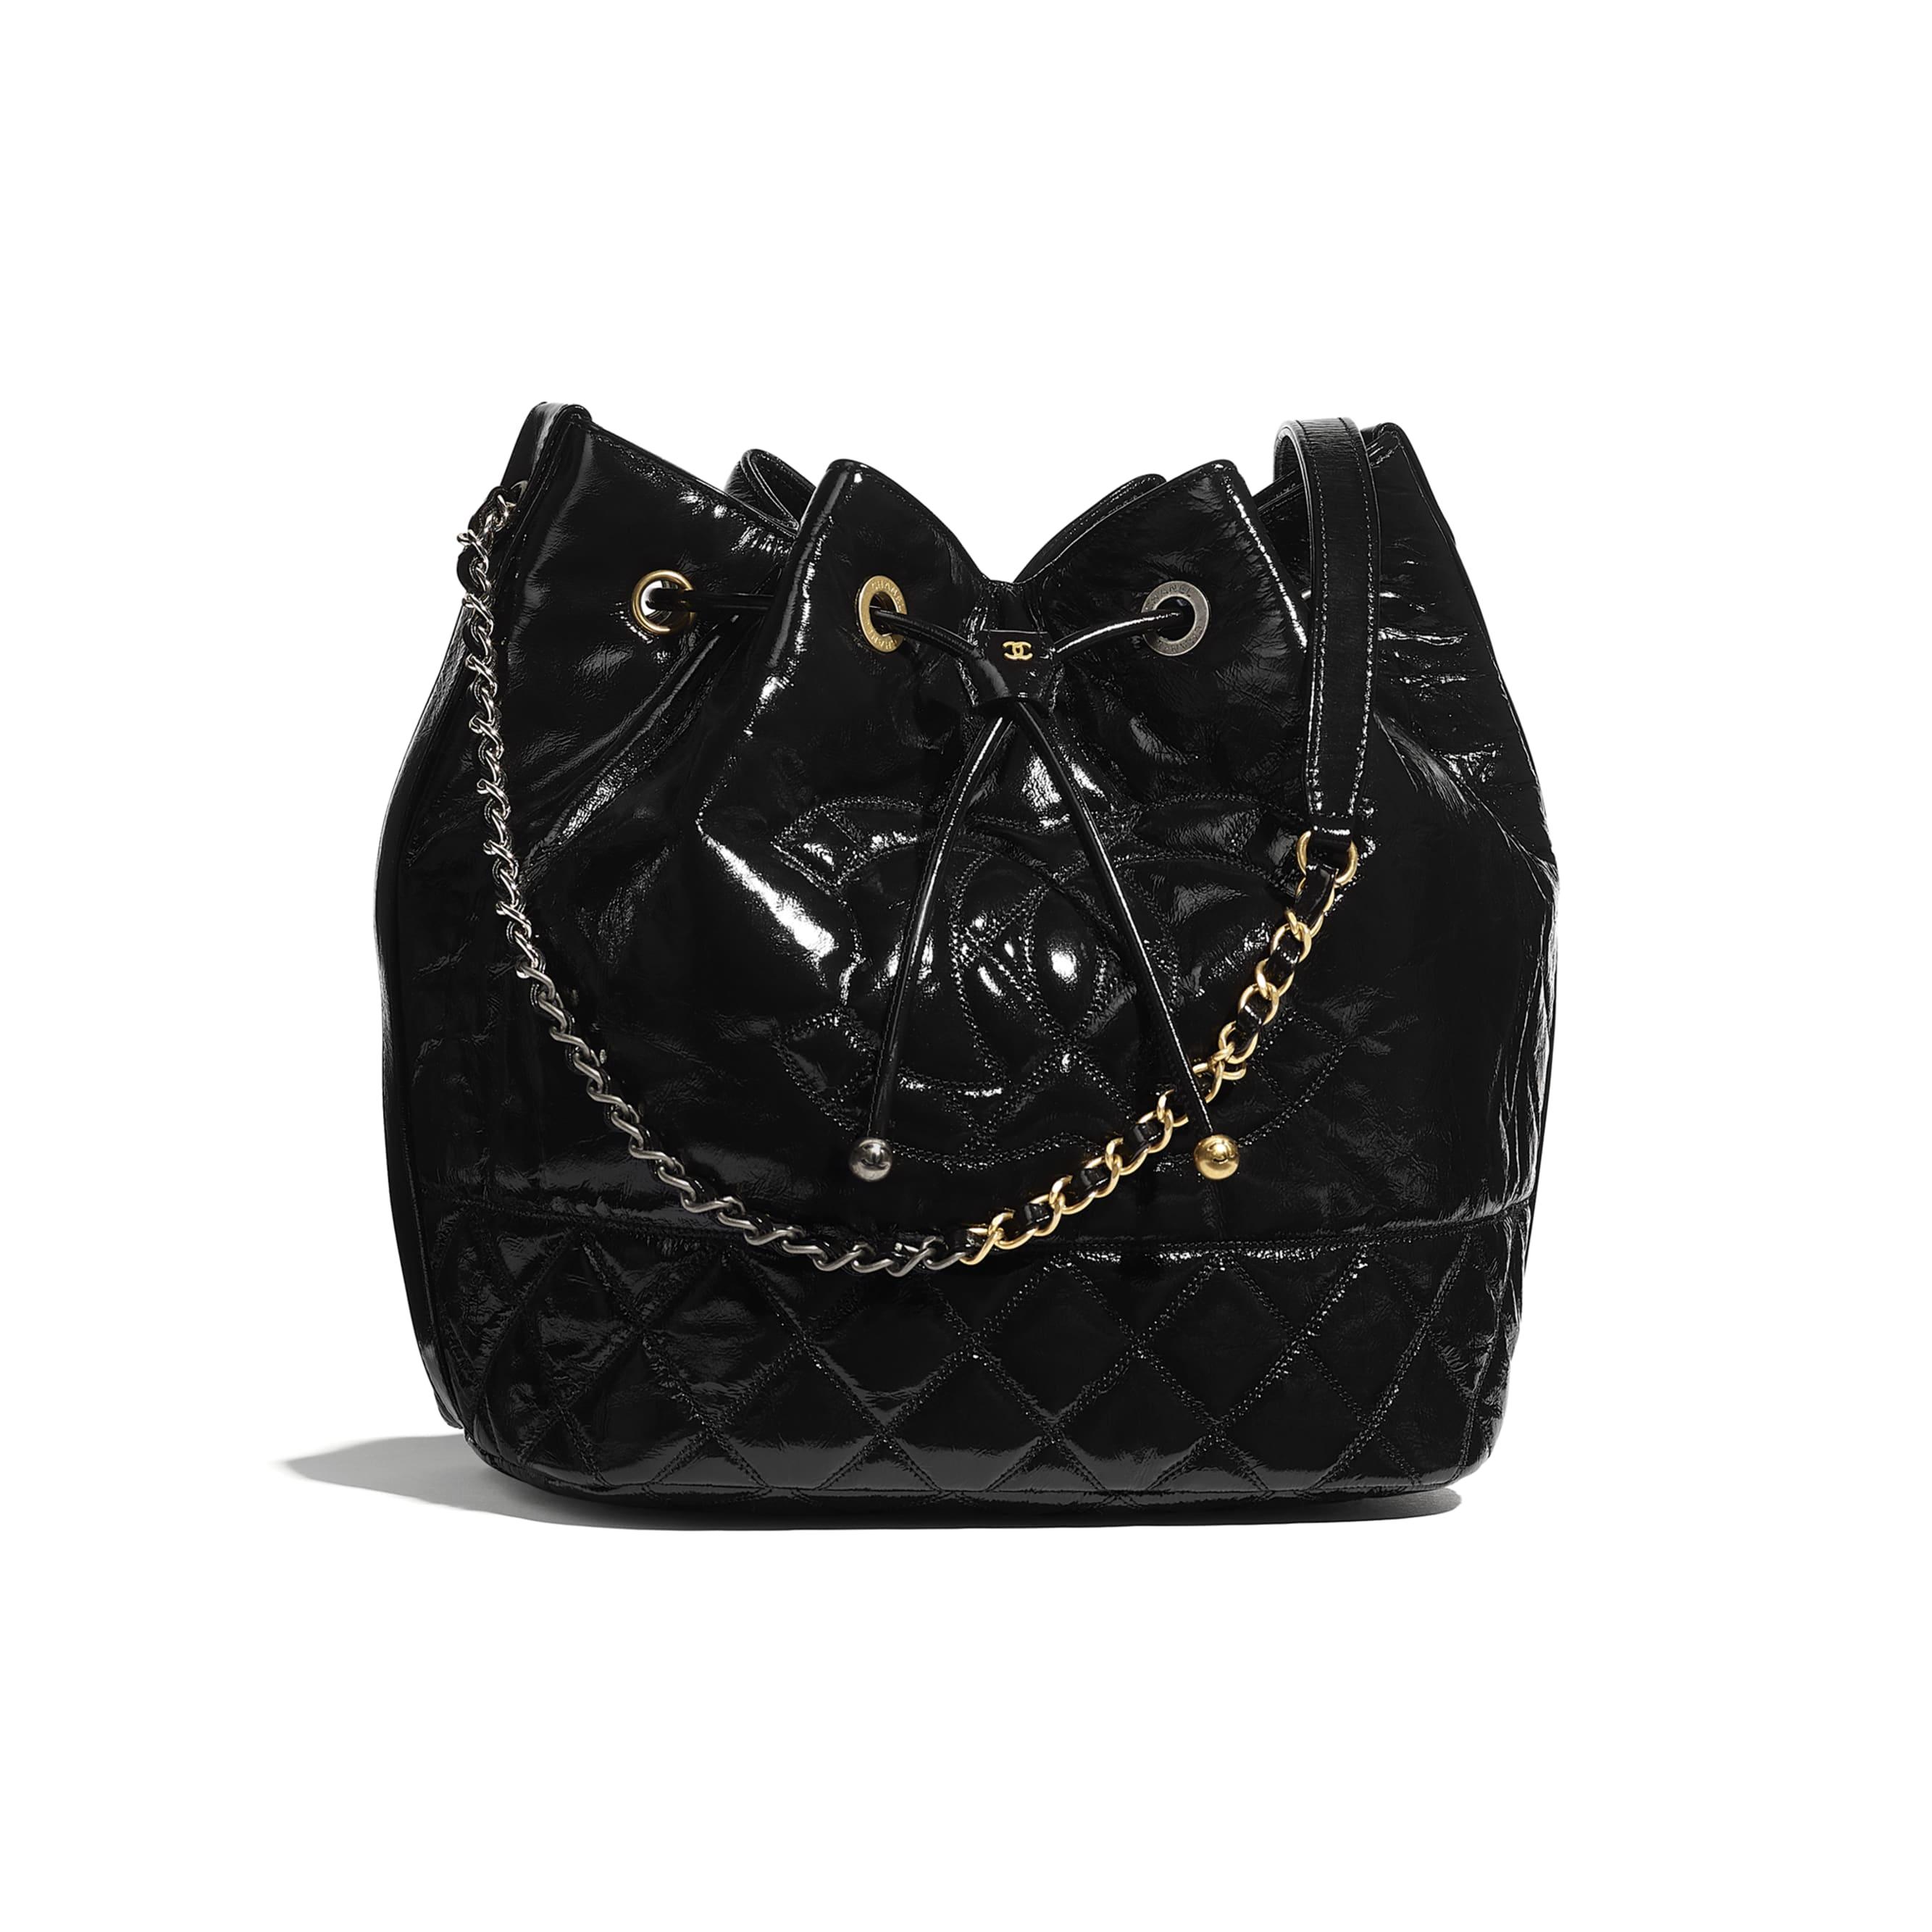 Large Drawstring Bag - Black - Shiny Aged Calfskin, Gold-Tone, Silver-Tone & Ruthenium-Finish Metal - CHANEL - Default view - see standard sized version